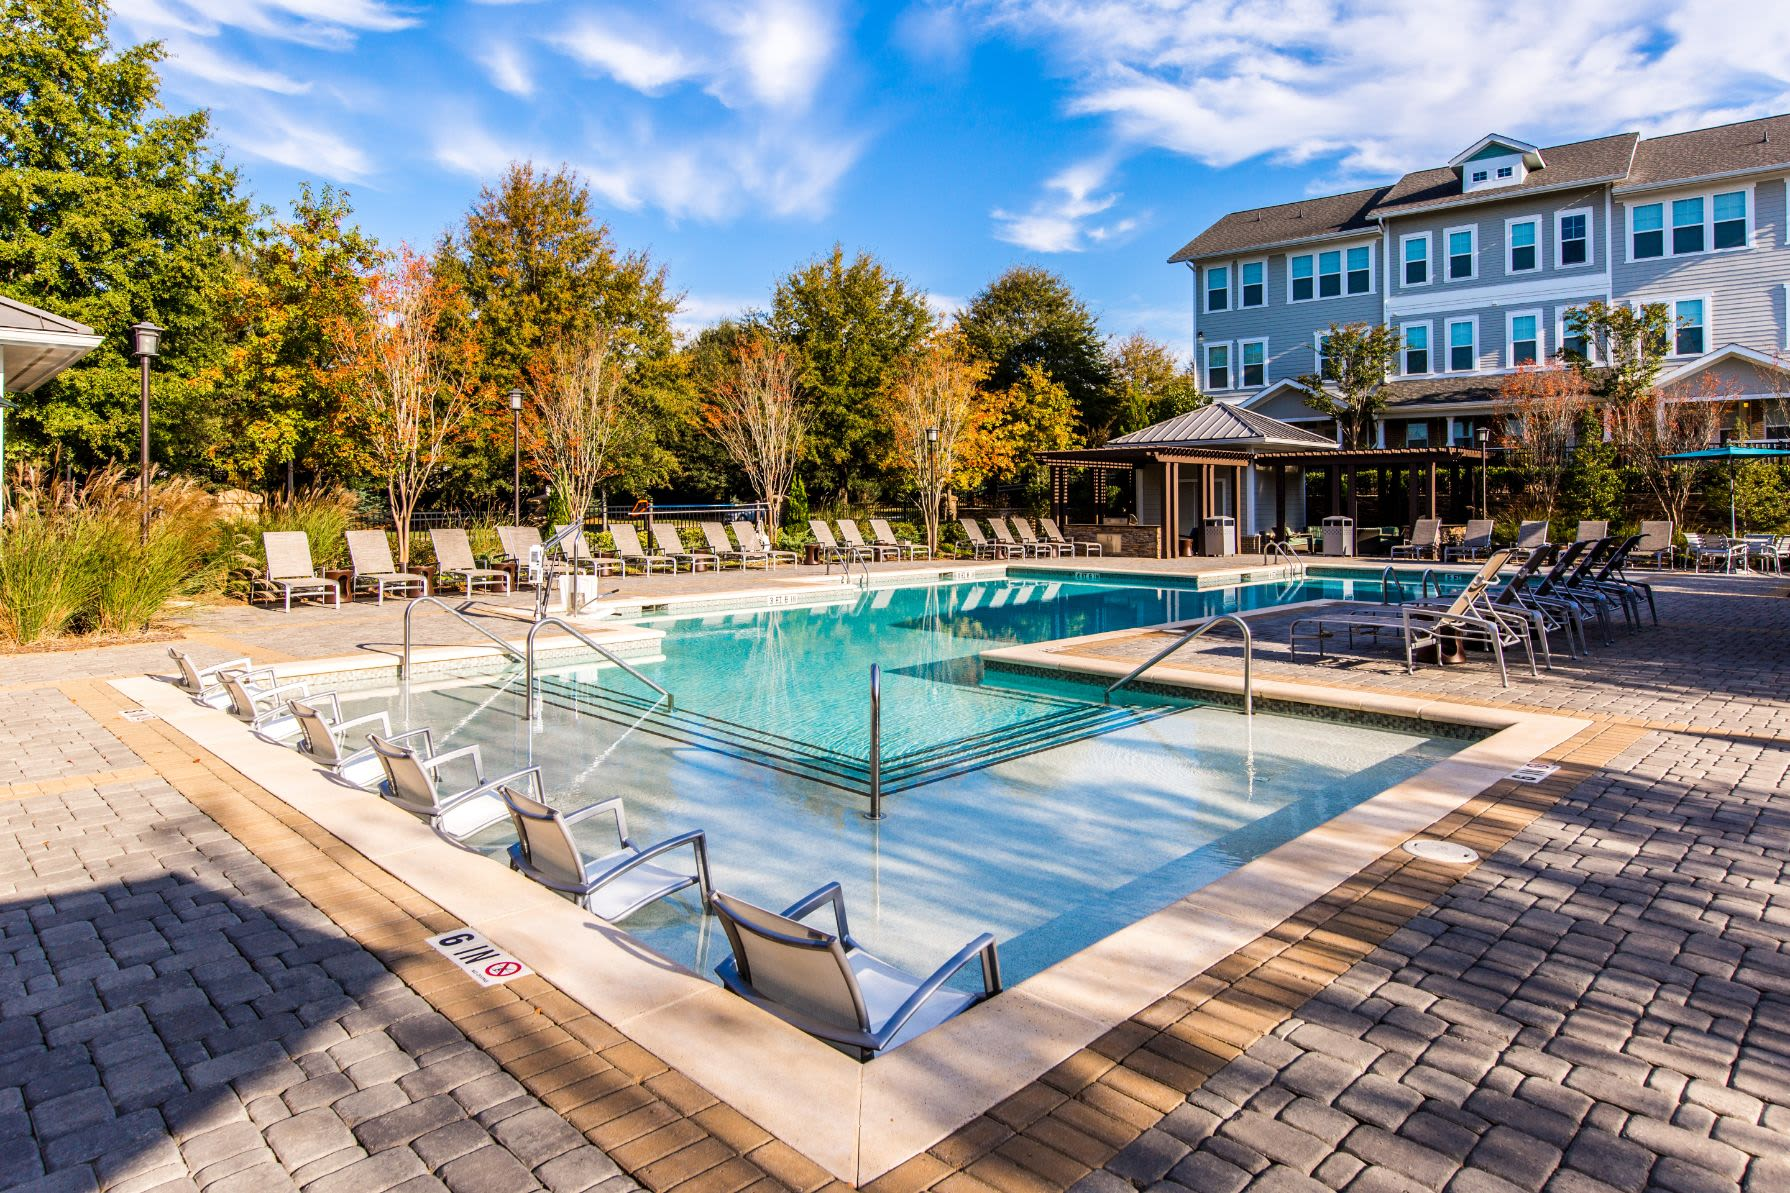 Sparkling swimming pool at Marquis at Morrison Plantation in Mooresville, North Carolina